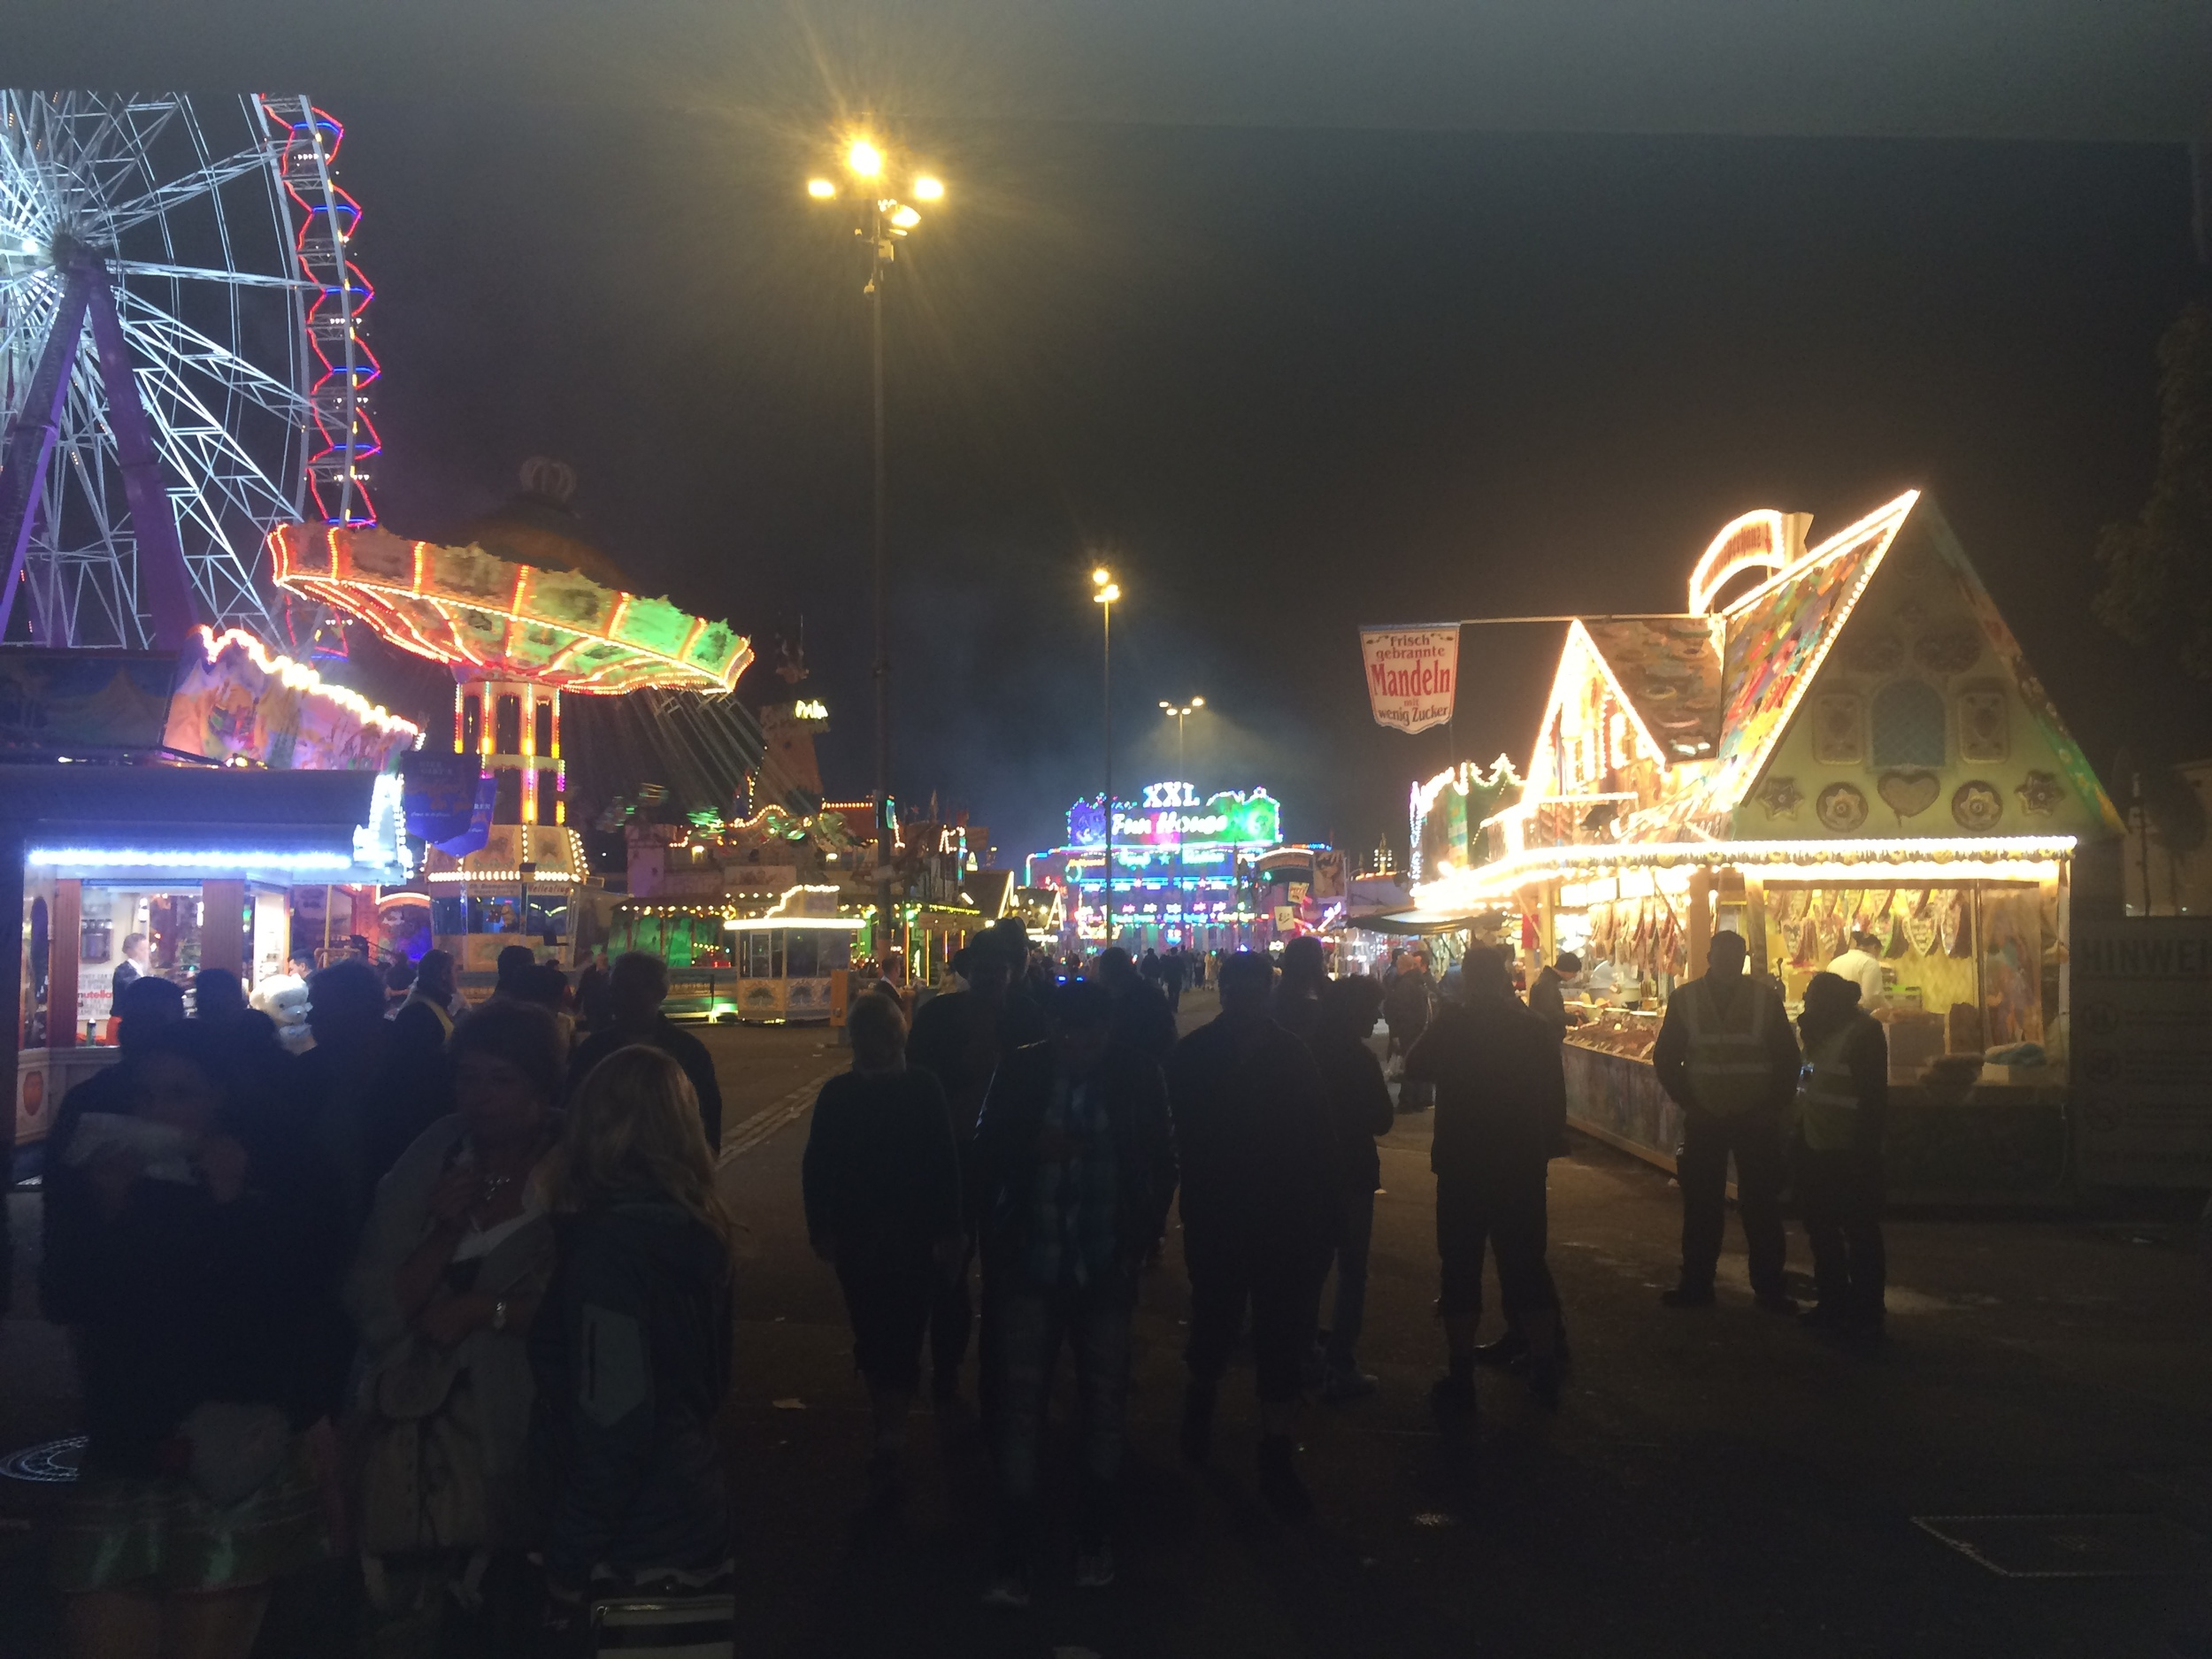 Stuttgart's Oktoberfest, Volksfest